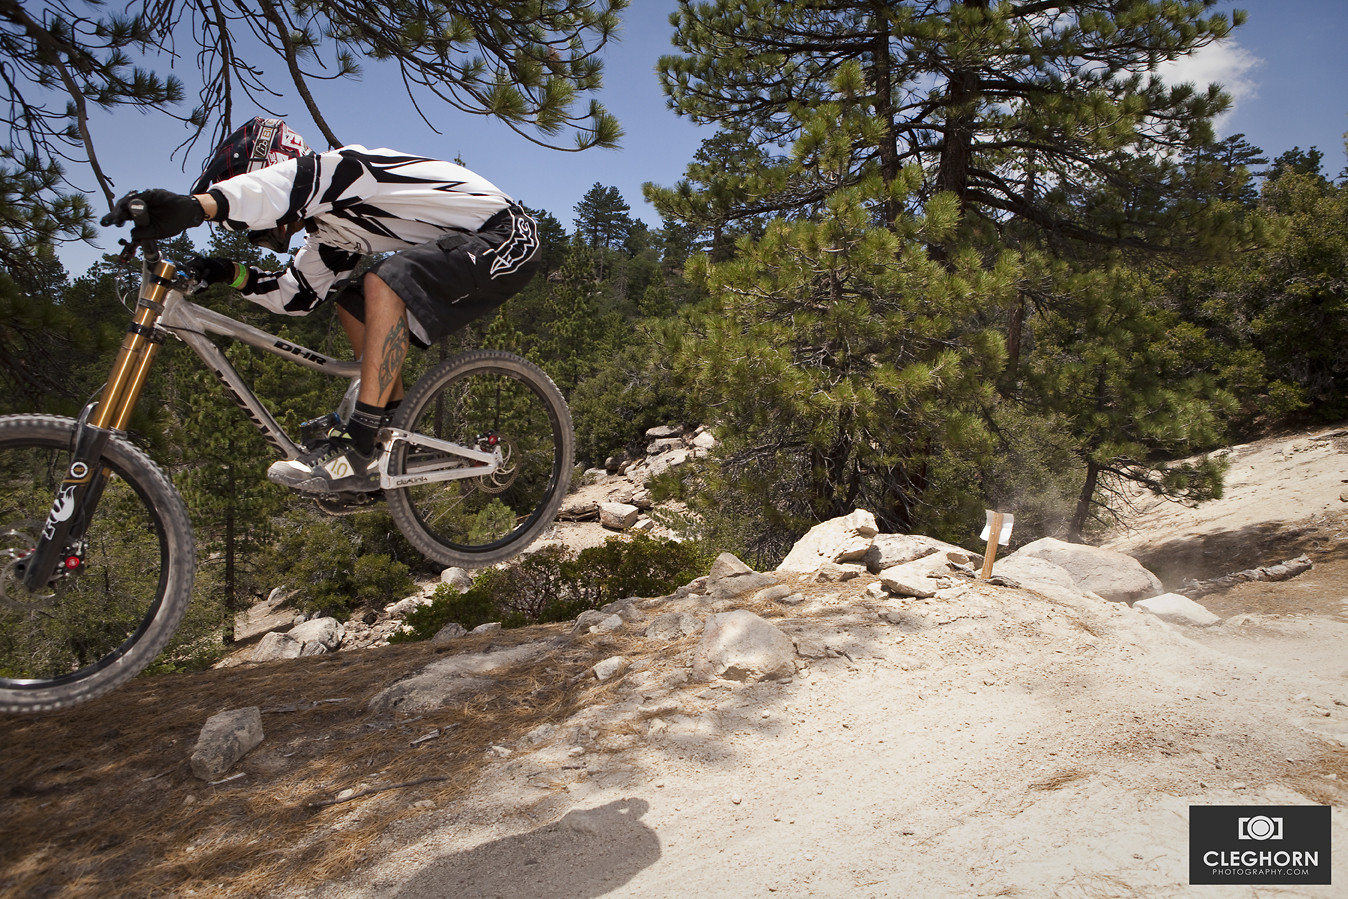 MG 0466 - Cleghorn Photography - Mountain Biking Pictures - Vital MTB